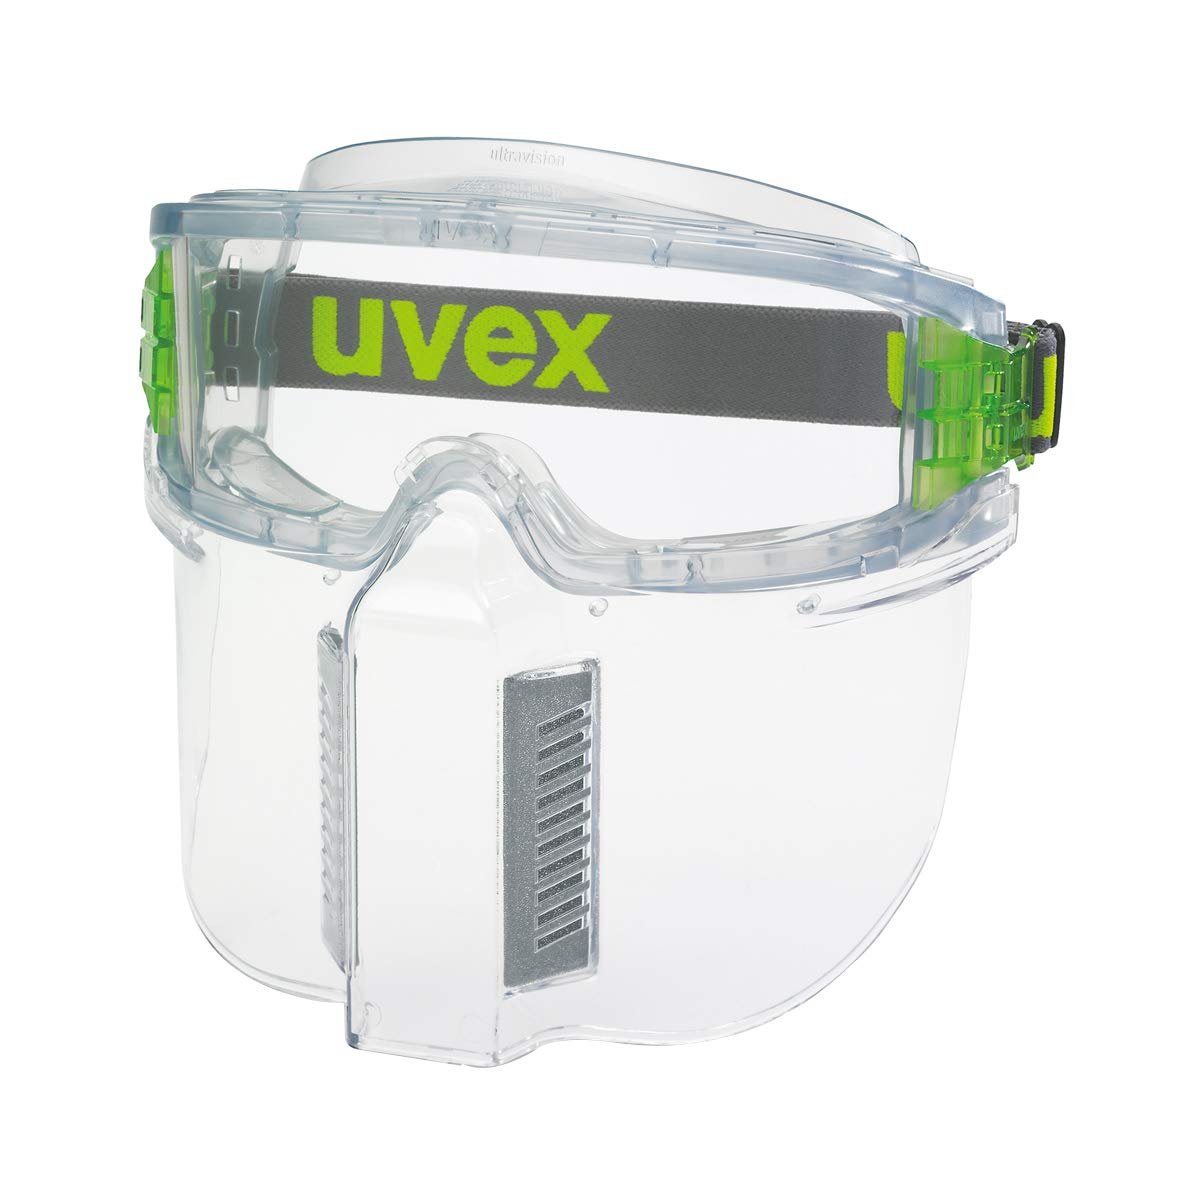 Gafas panorámicas de seguridad ultravision + Visor de protector facial (PACK)